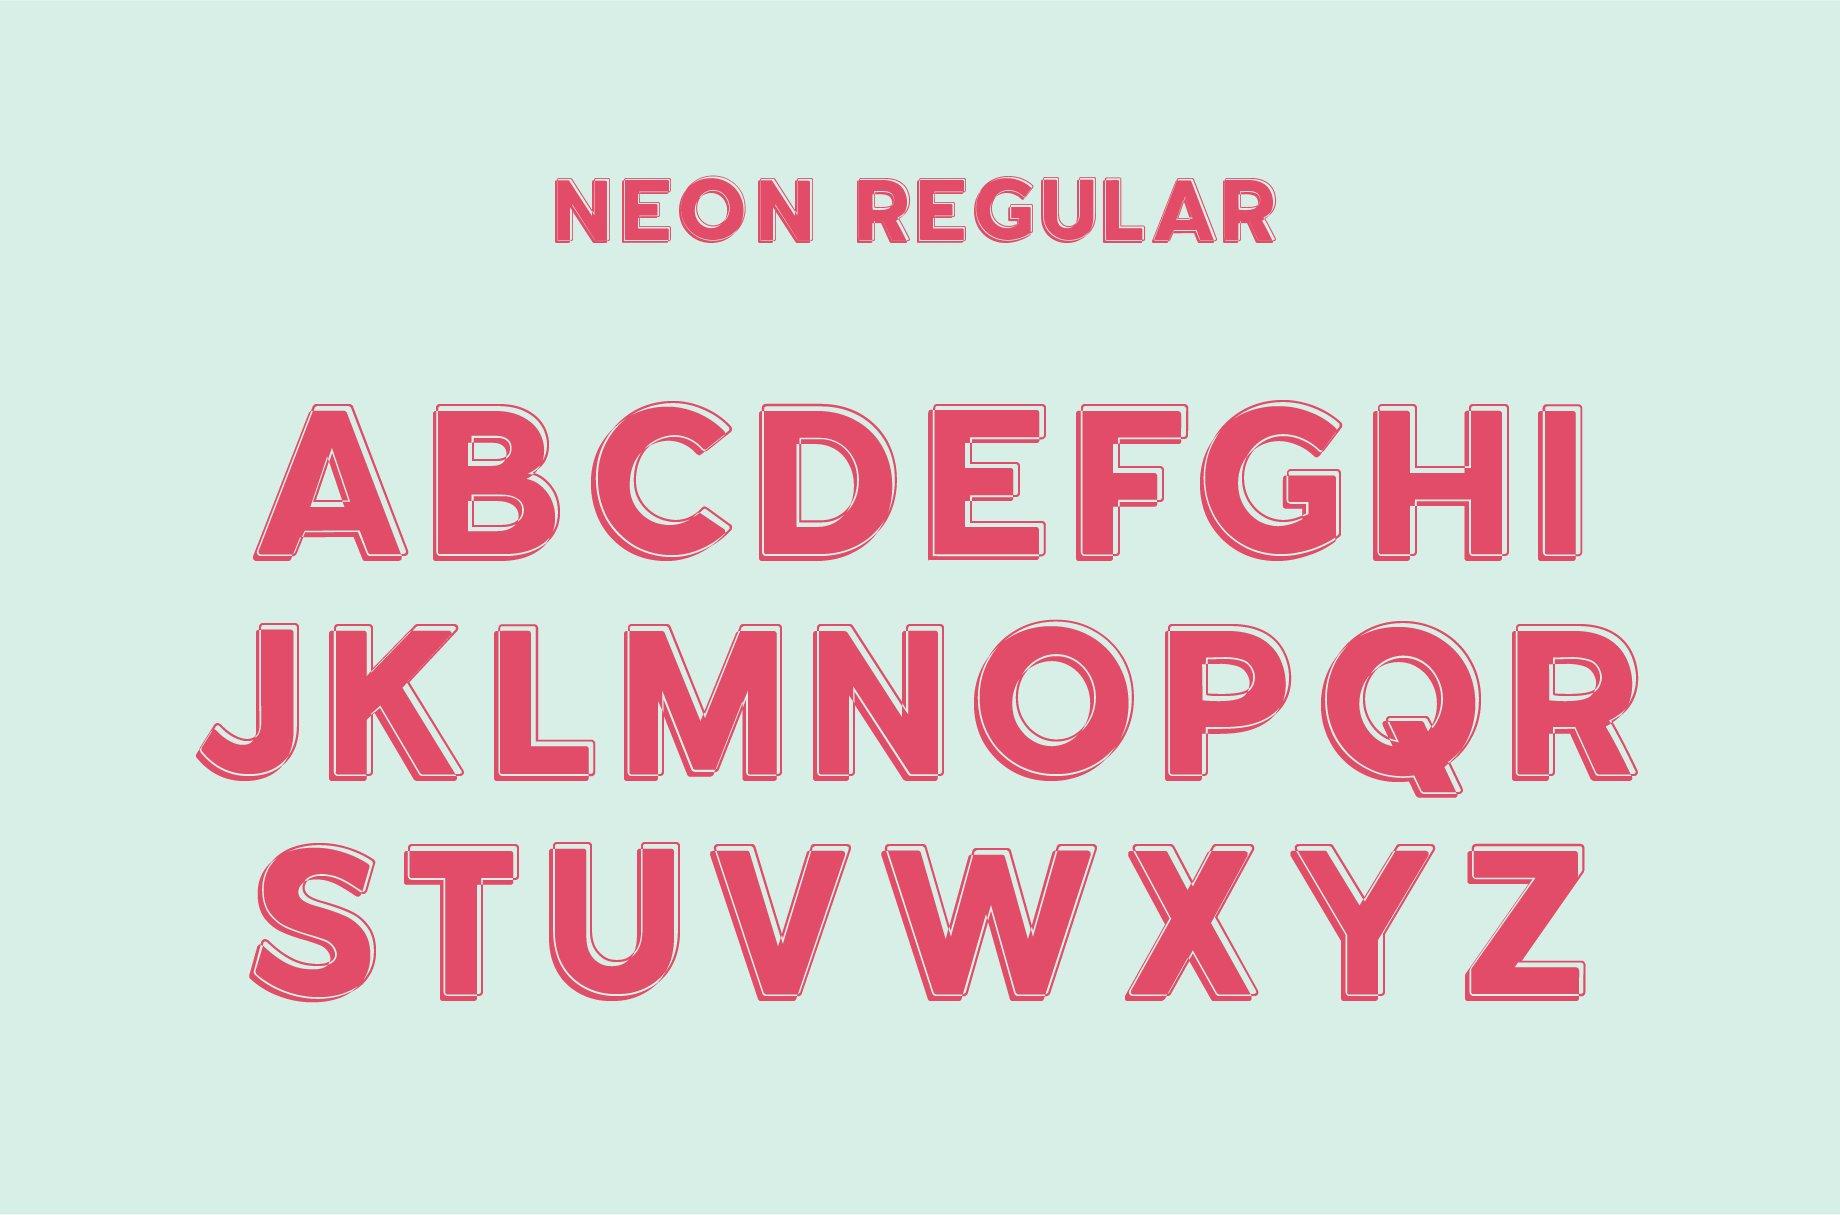 neon-font-by-big-cat-creative-01-.jpg